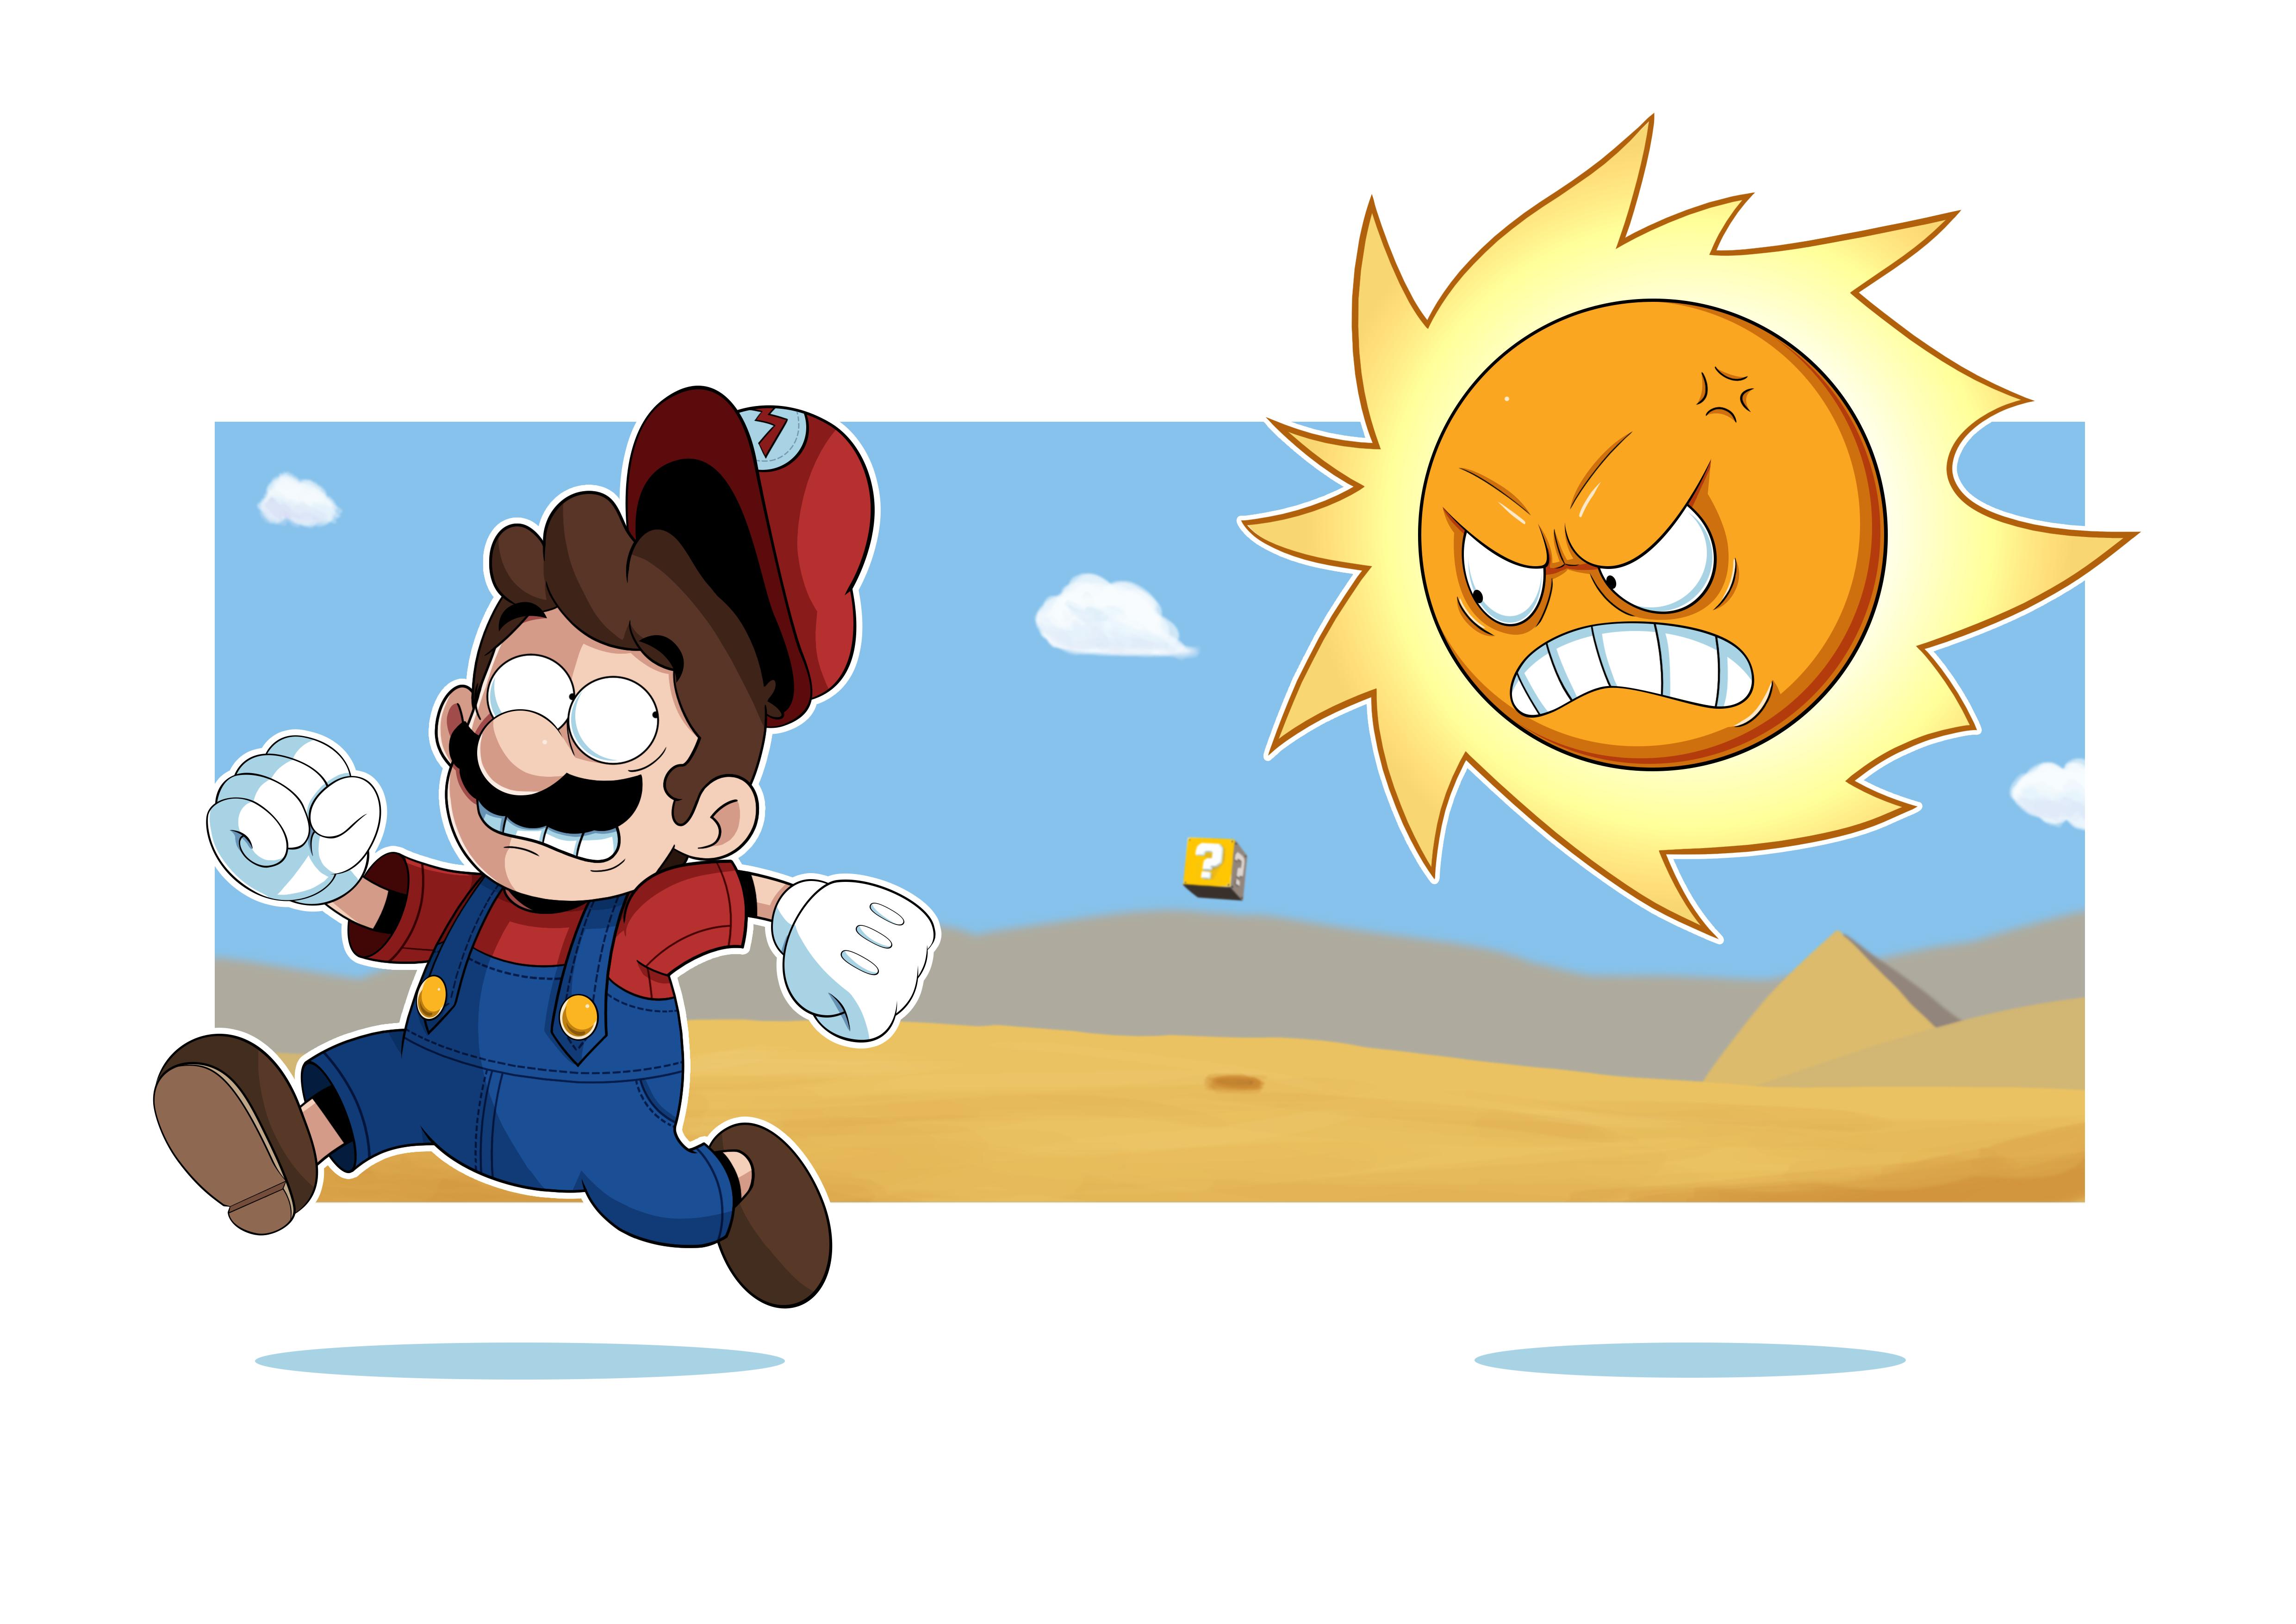 mario bros 3 angry sun